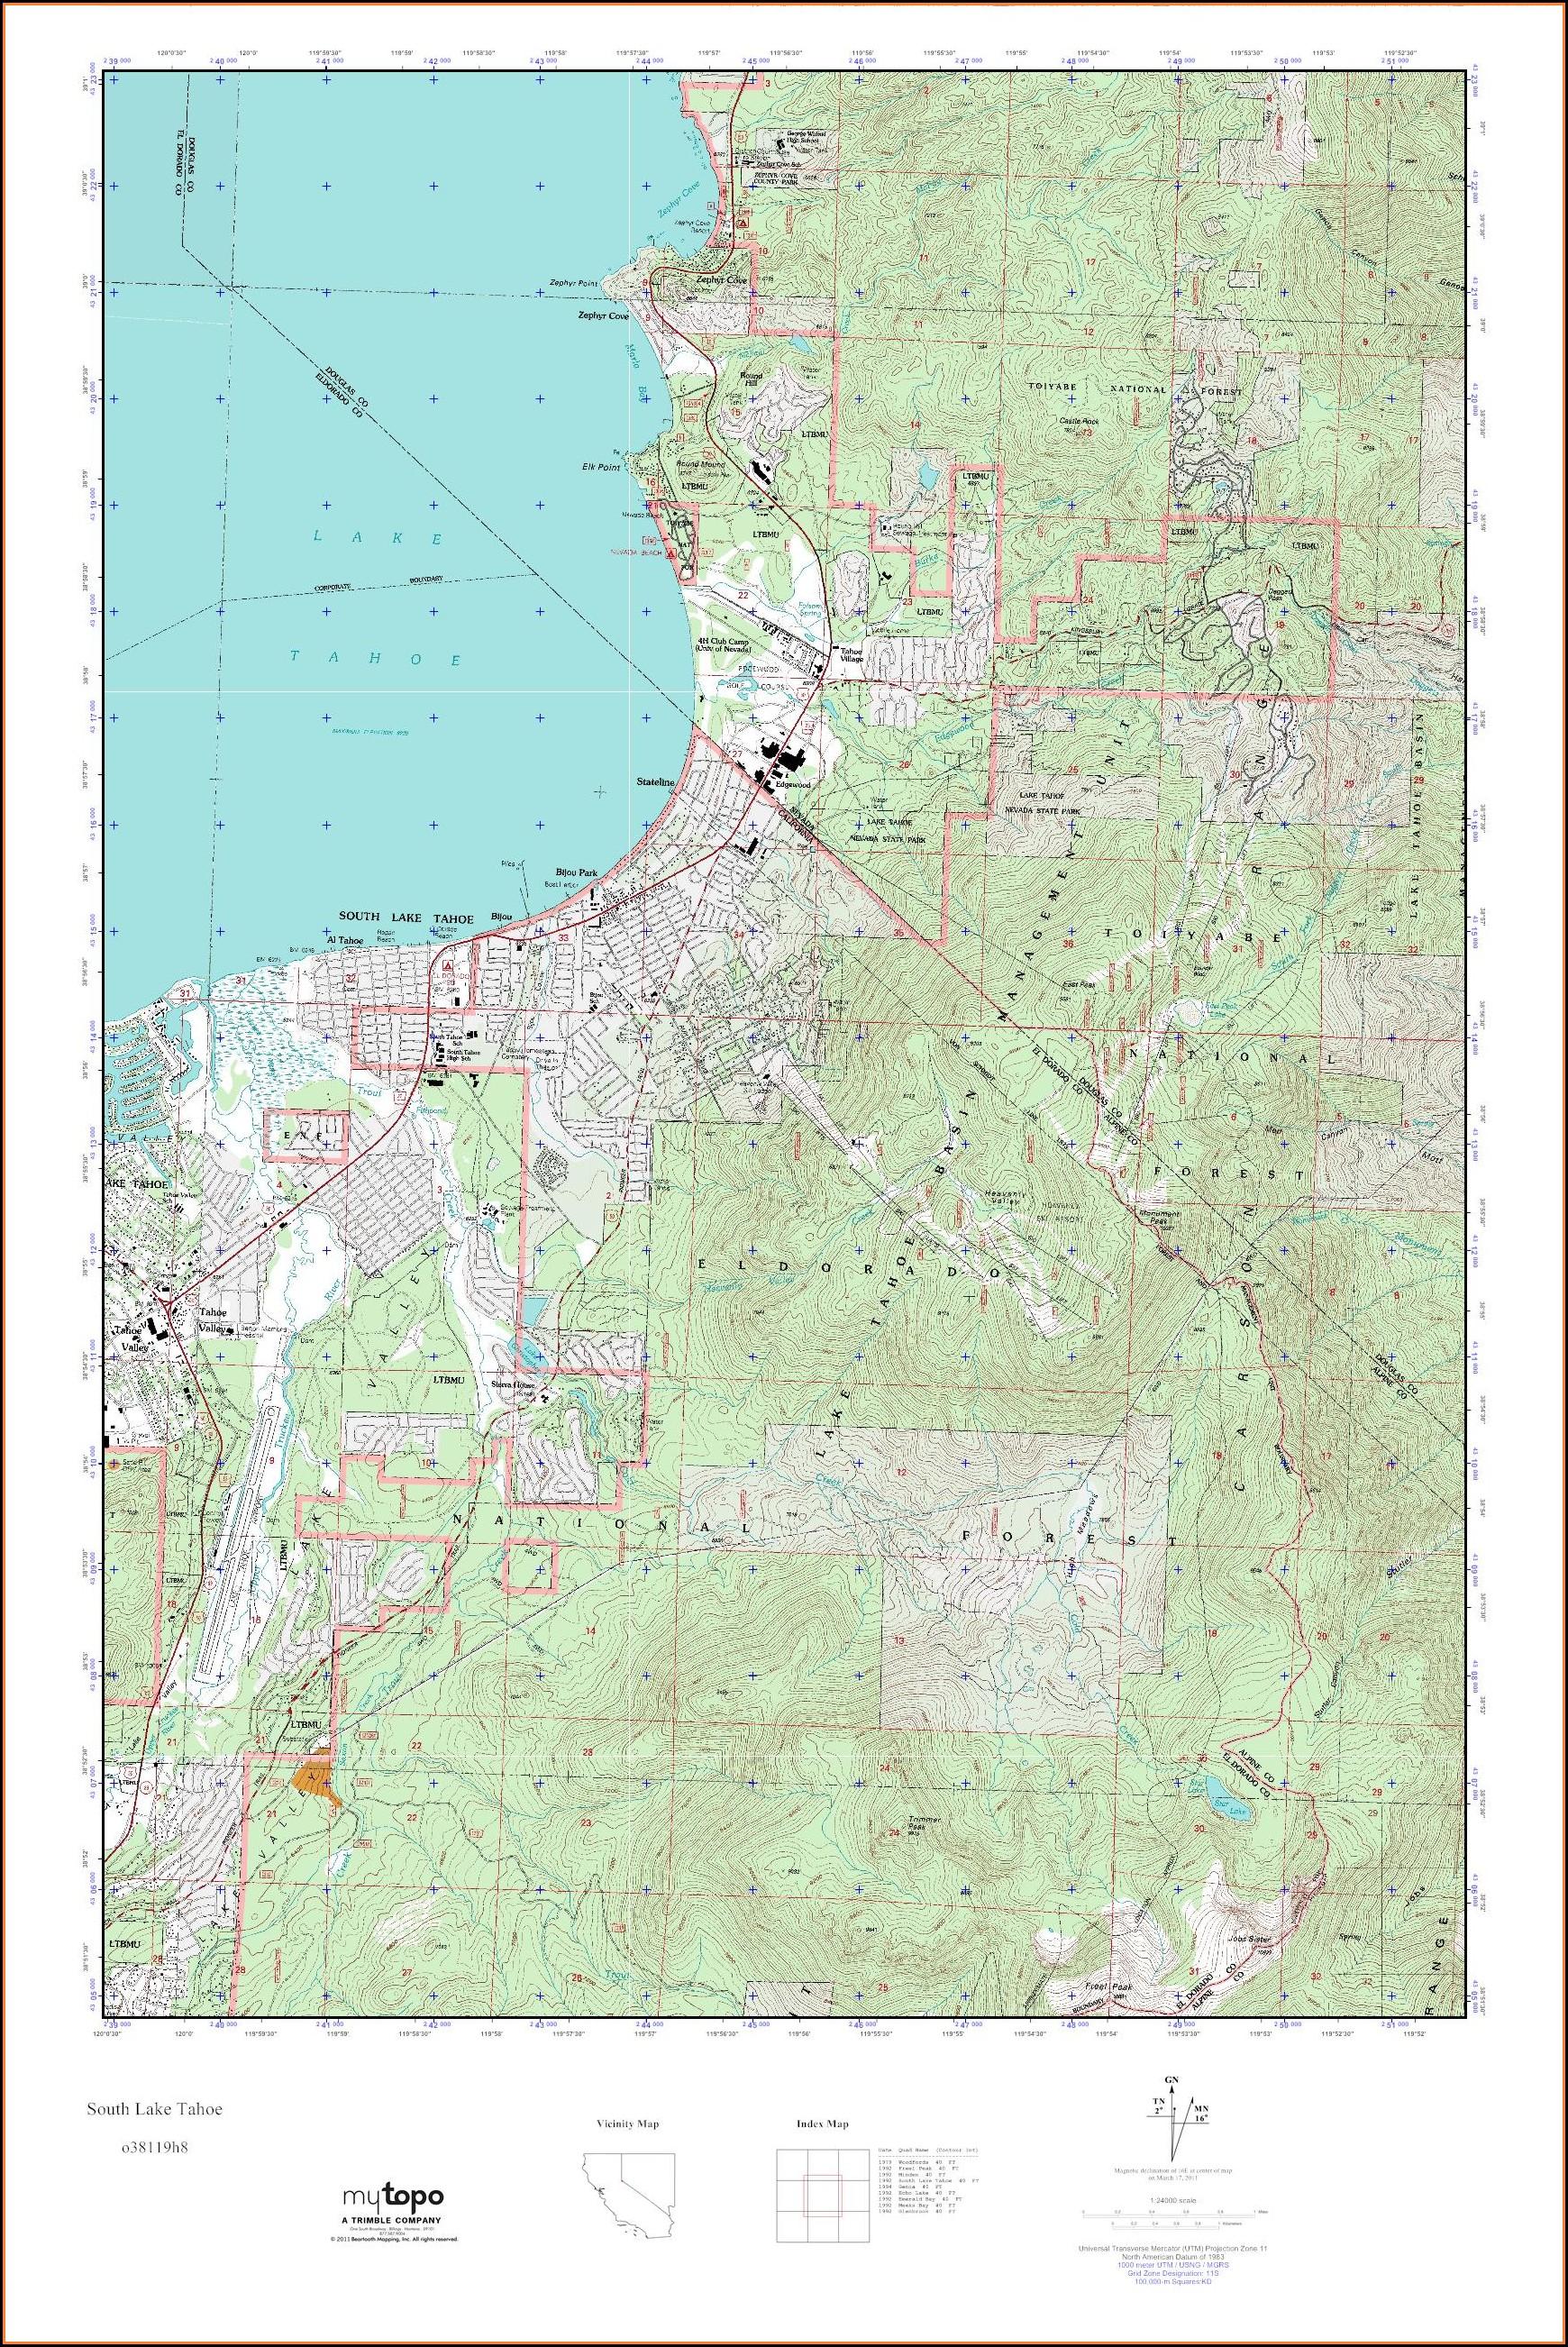 South Lake Tahoe Topo Map